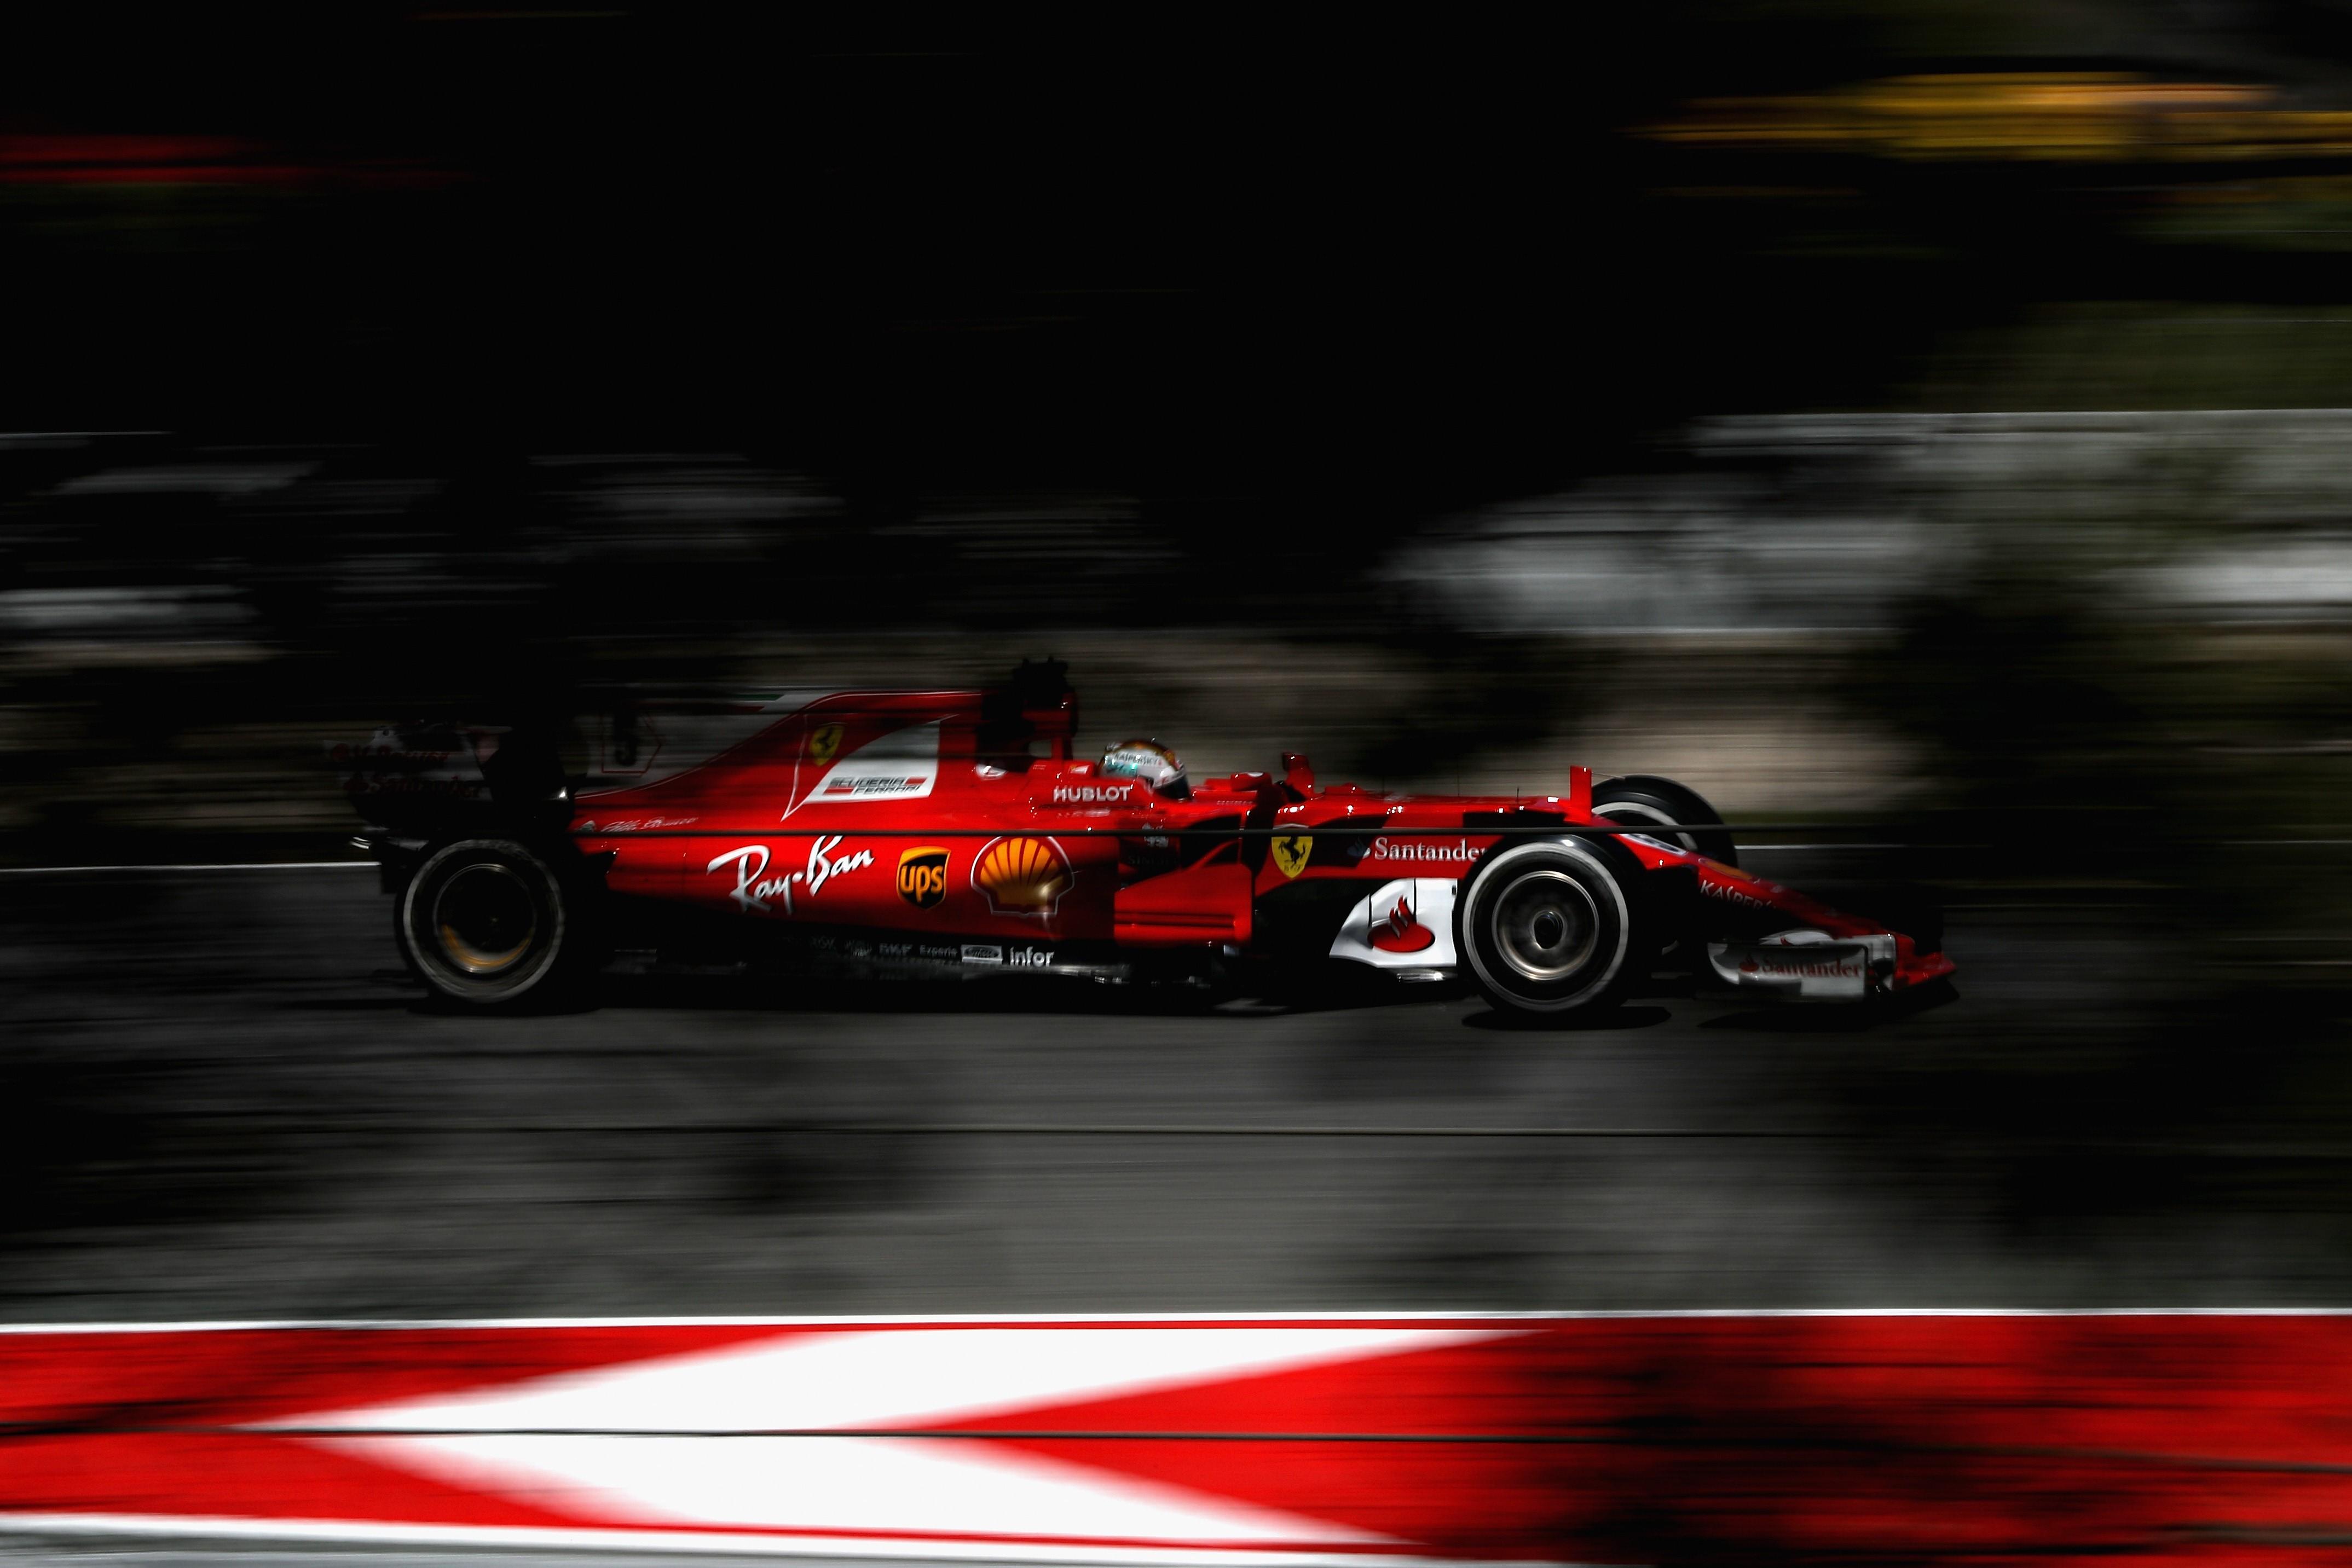 Sebastian Vettel (Ferrari) au Grand Prix d'Espagne 2017